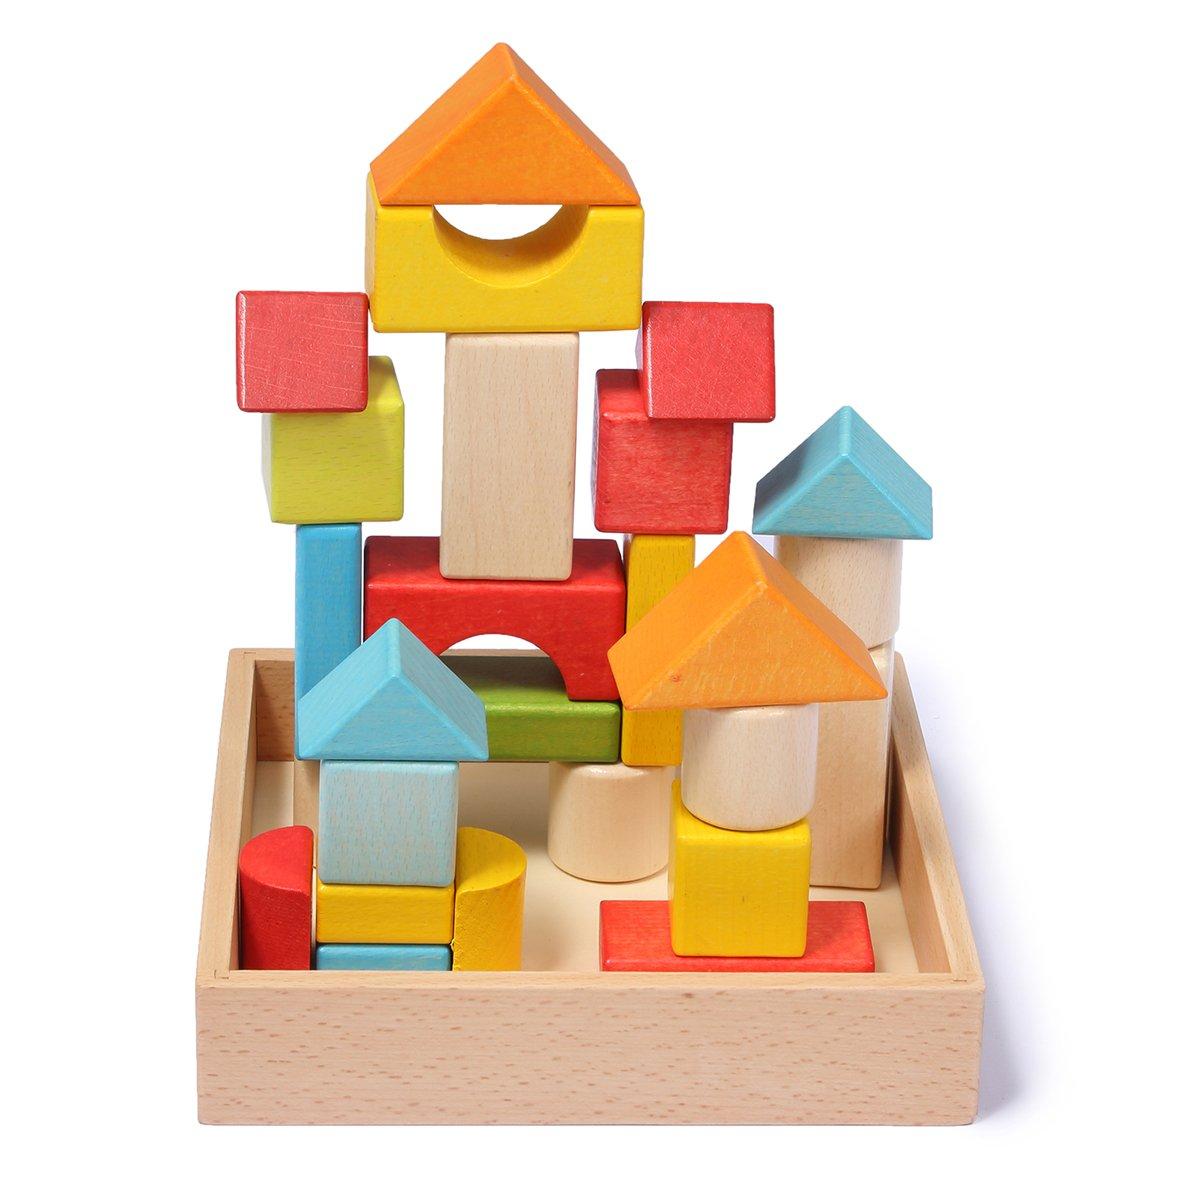 20% off Wondertoys 26 Pieces Building Blocks Set